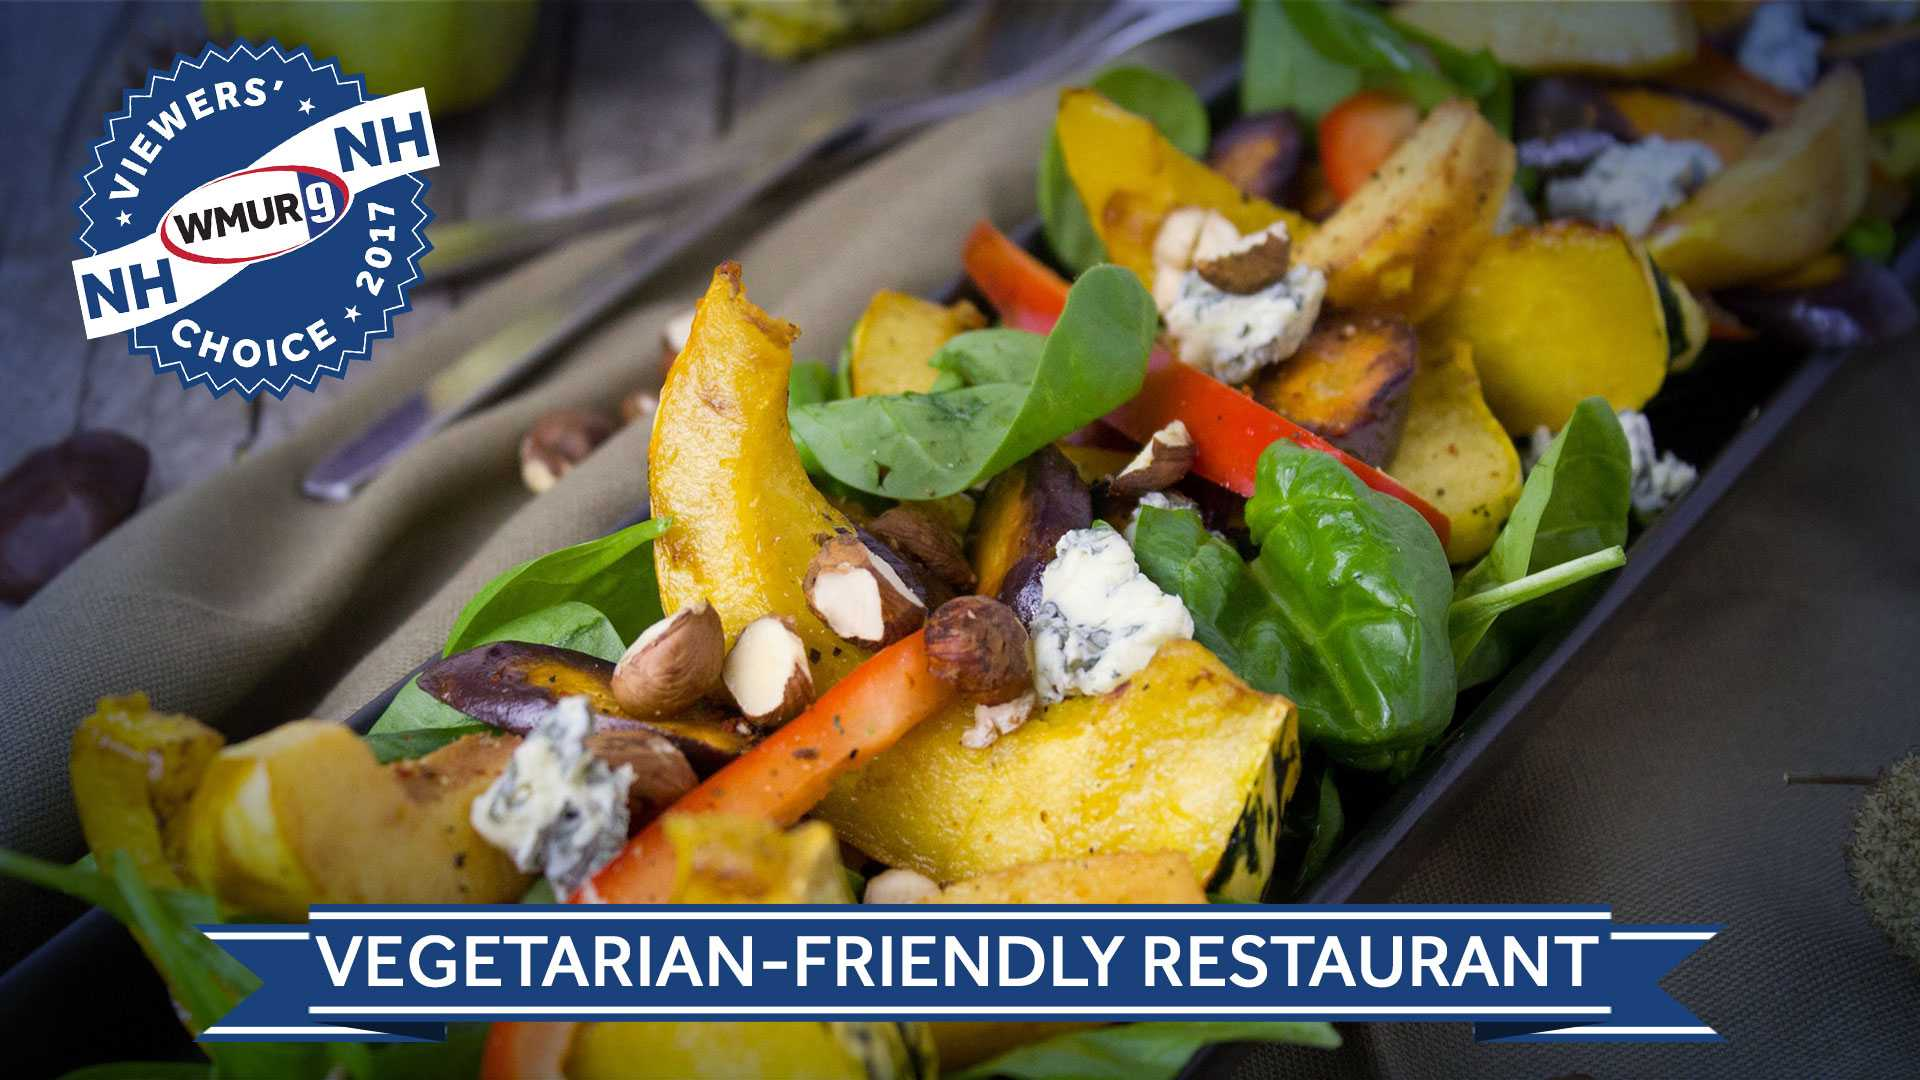 Vegan Restaurant New Hampshire